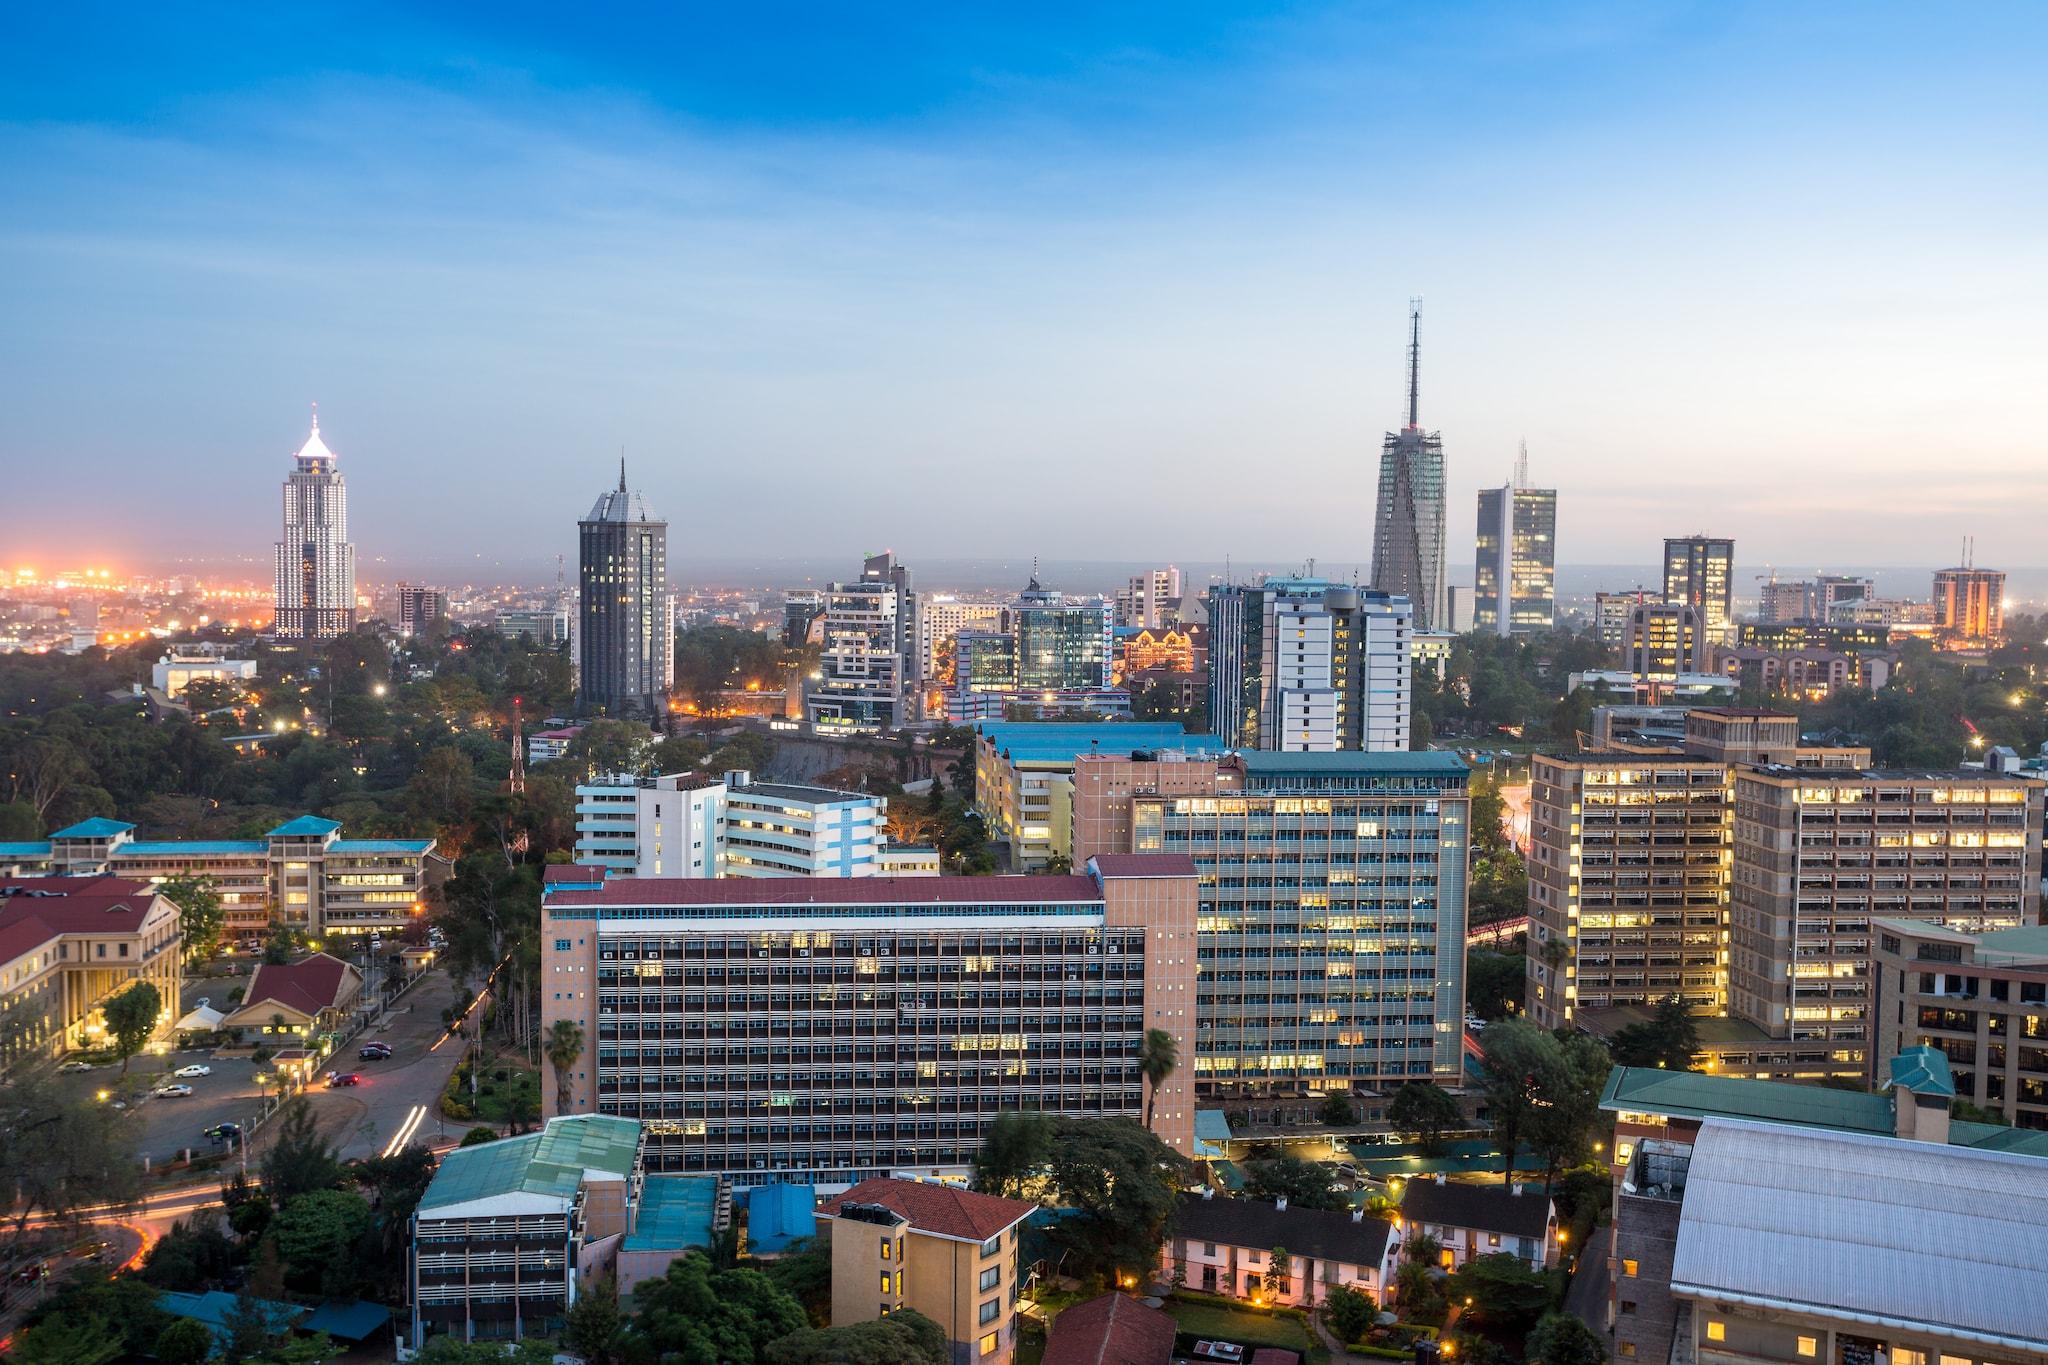 City view of Kenya in East Africa